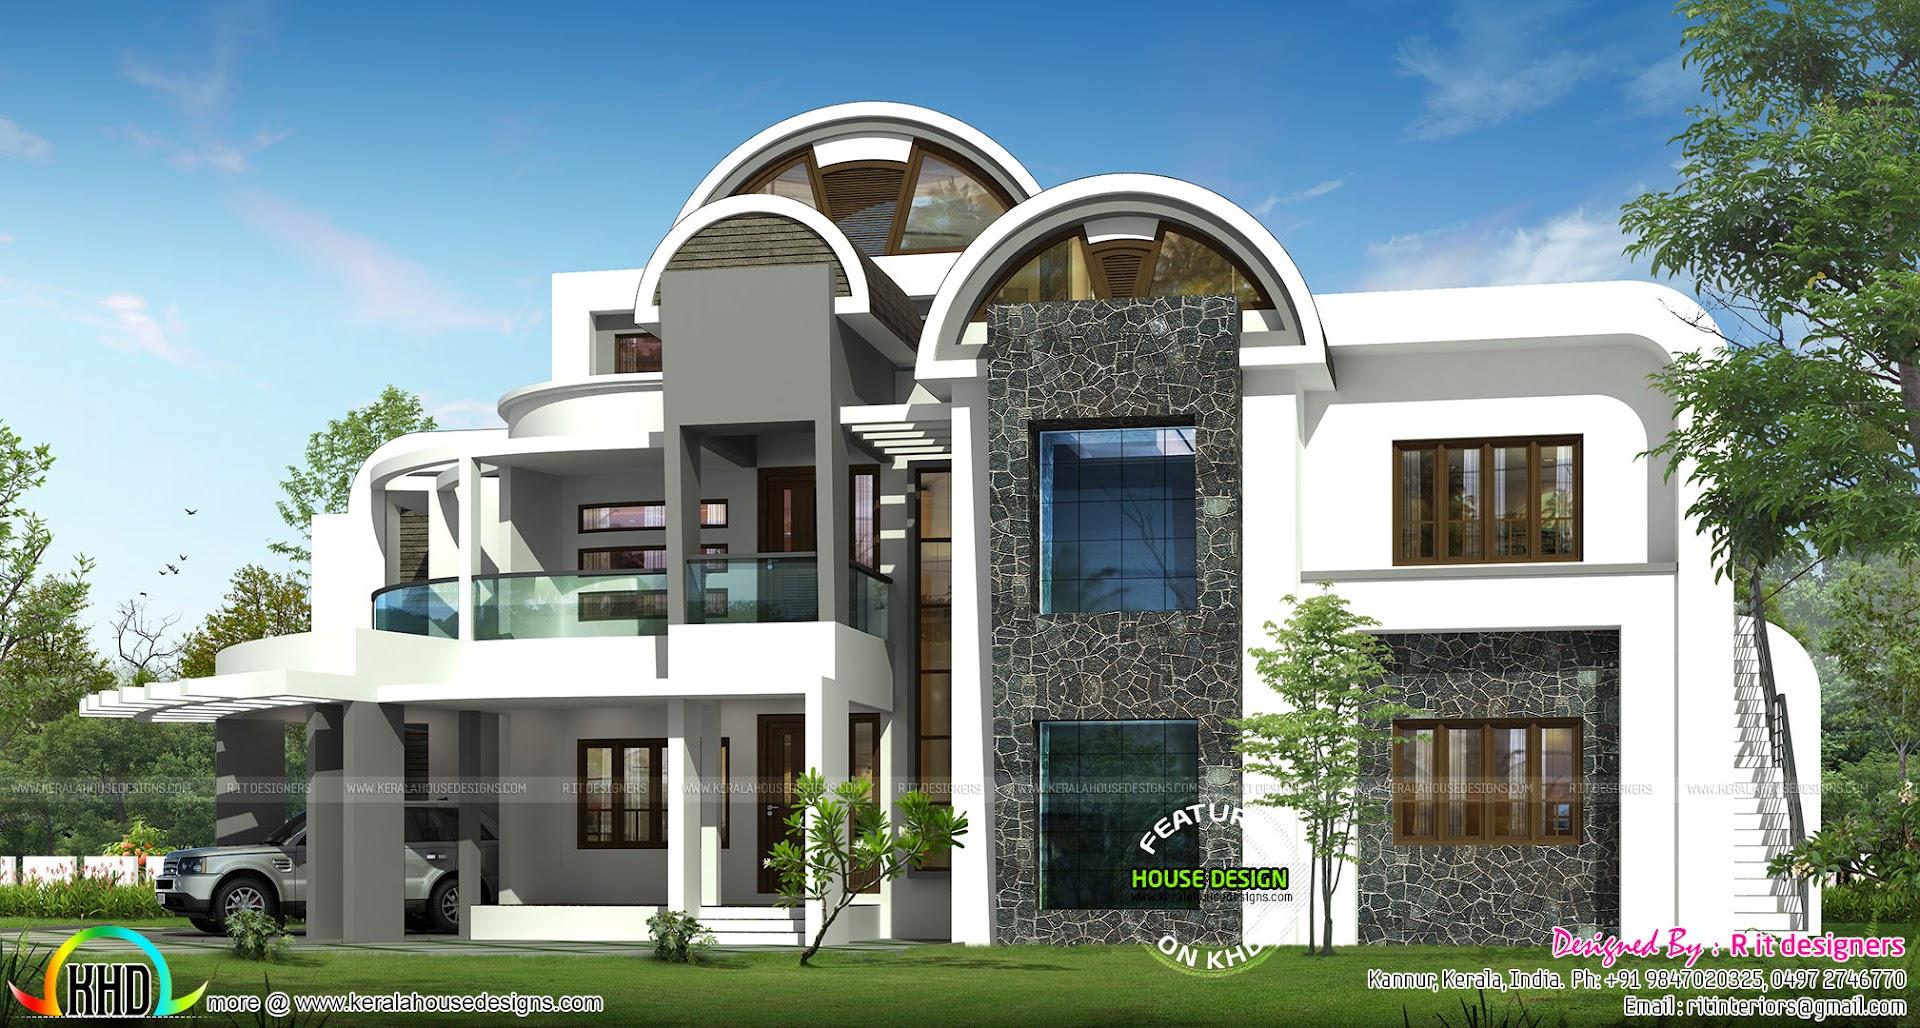 Half Round Roof Unique House Design Kerala Home Design